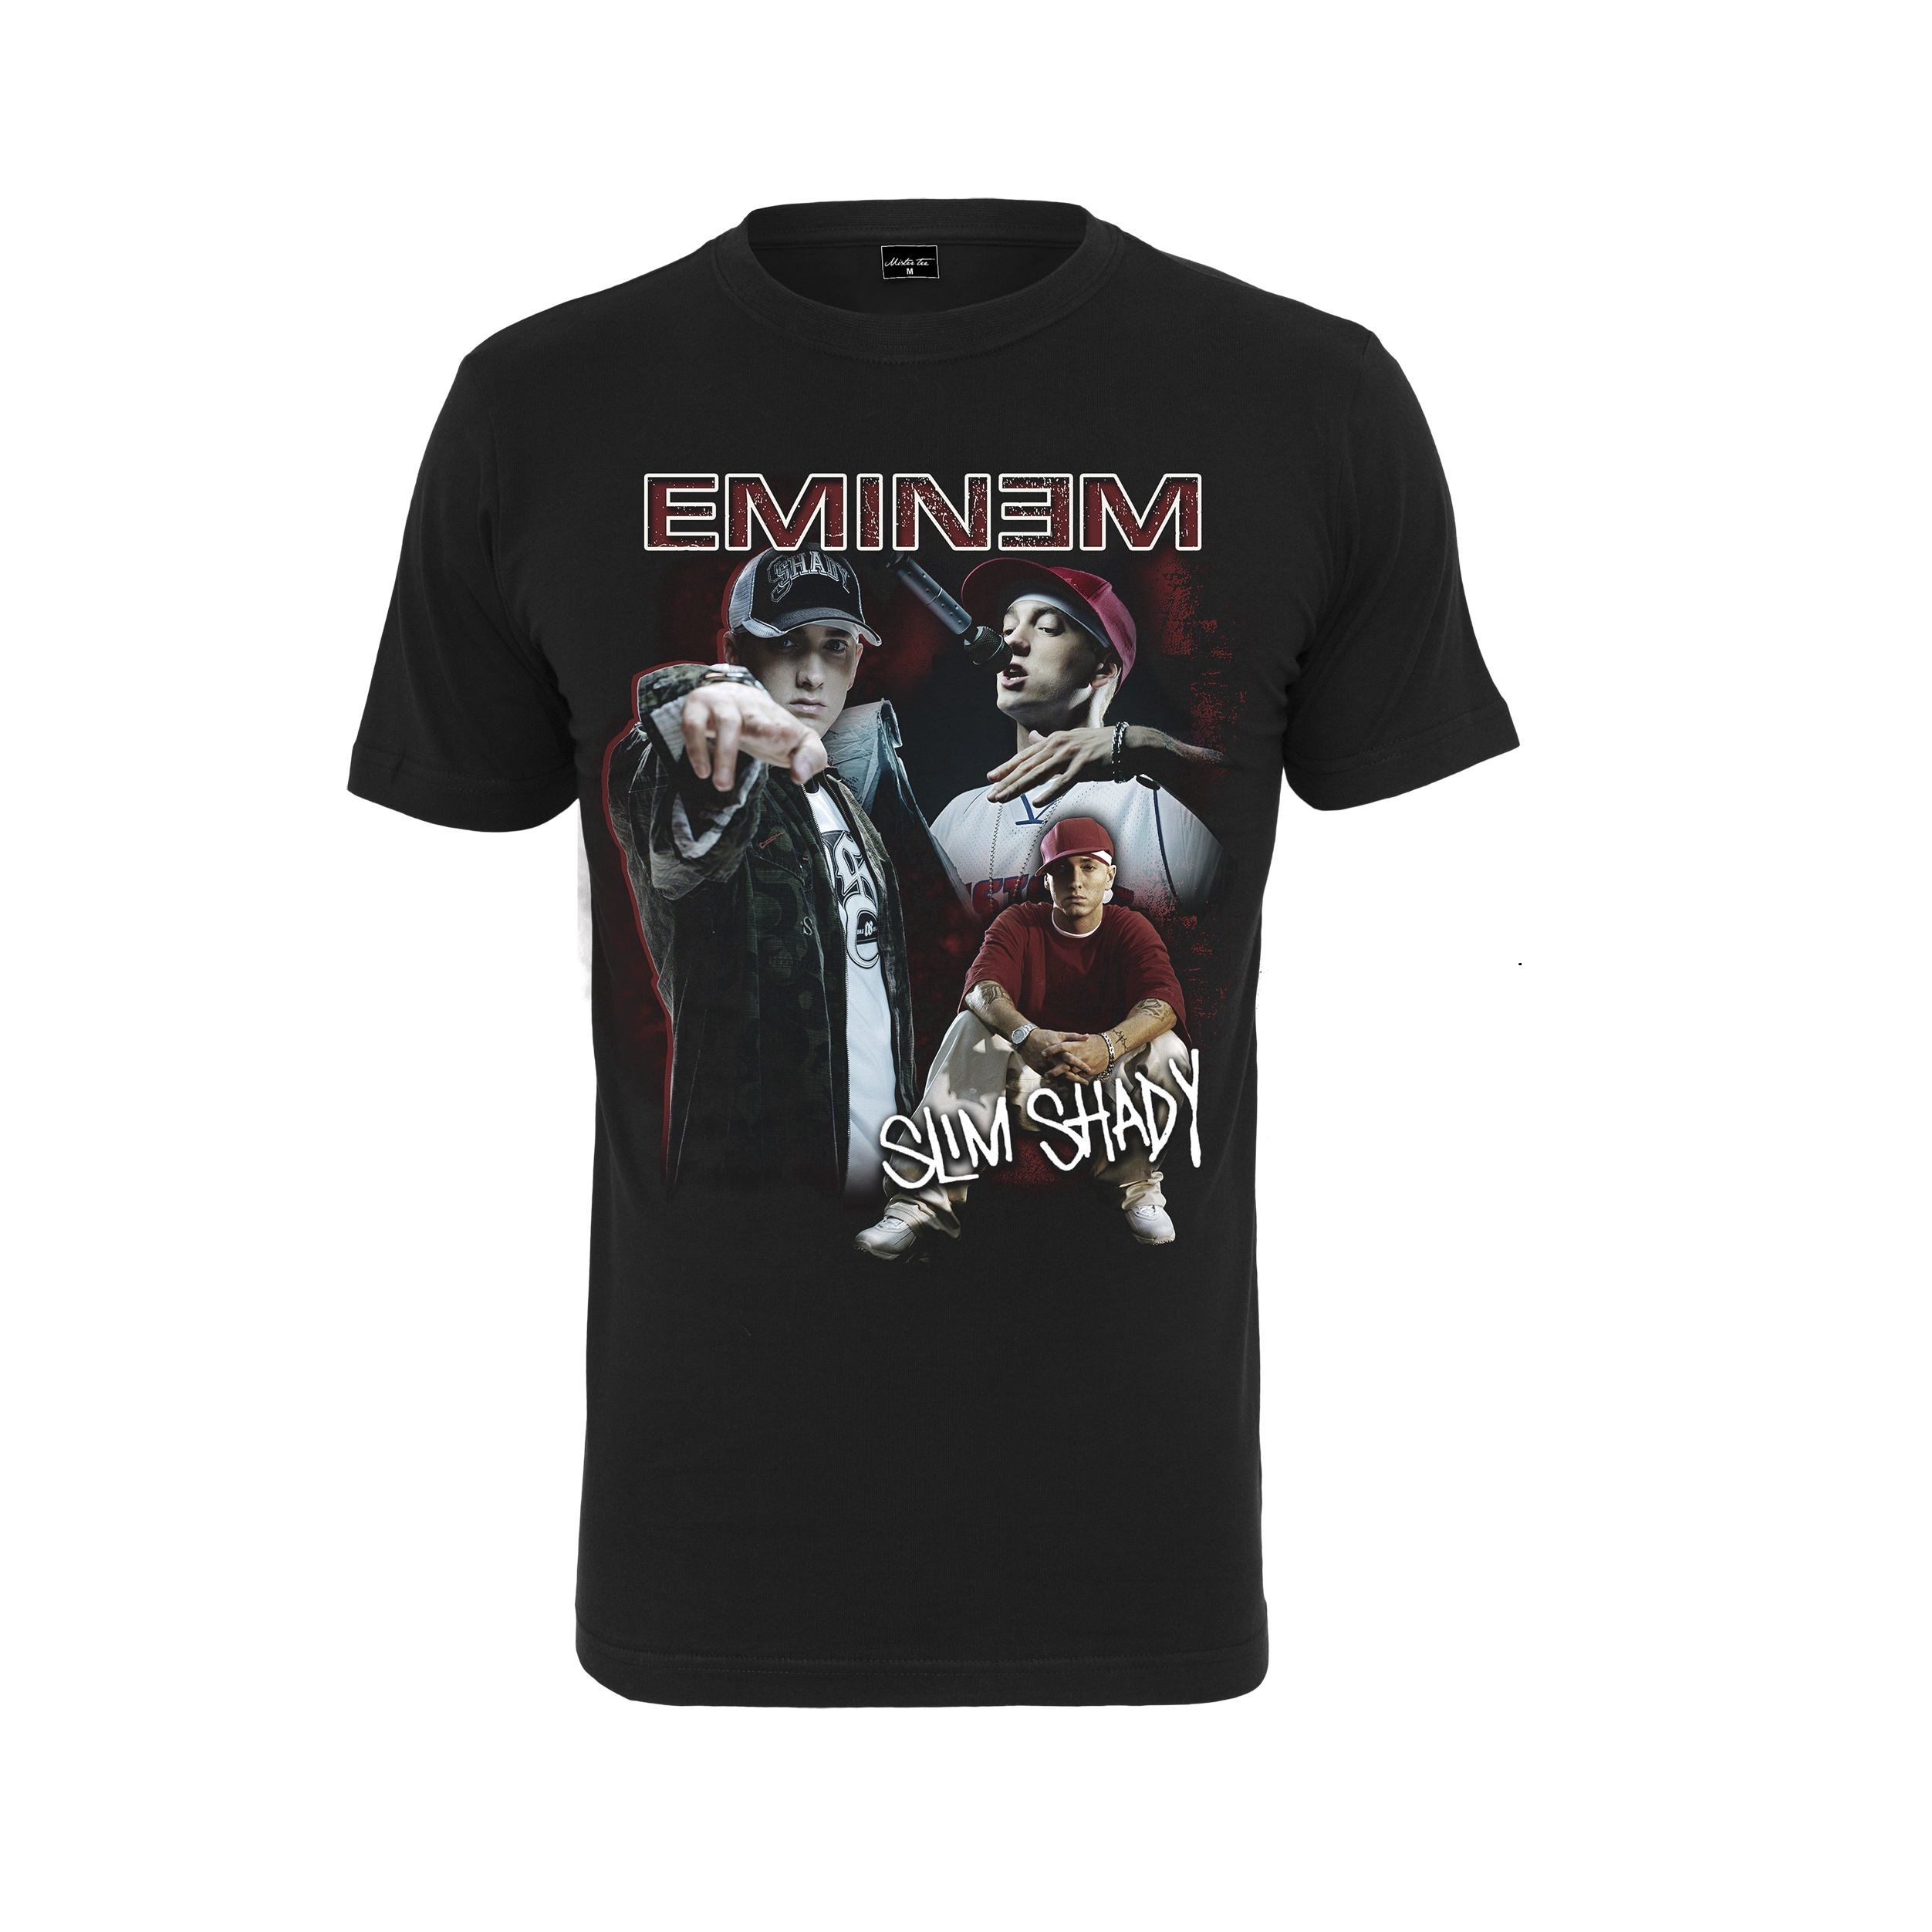 Eminem - Tričko Slim Shady Tee - Muž, Čierna, XXL